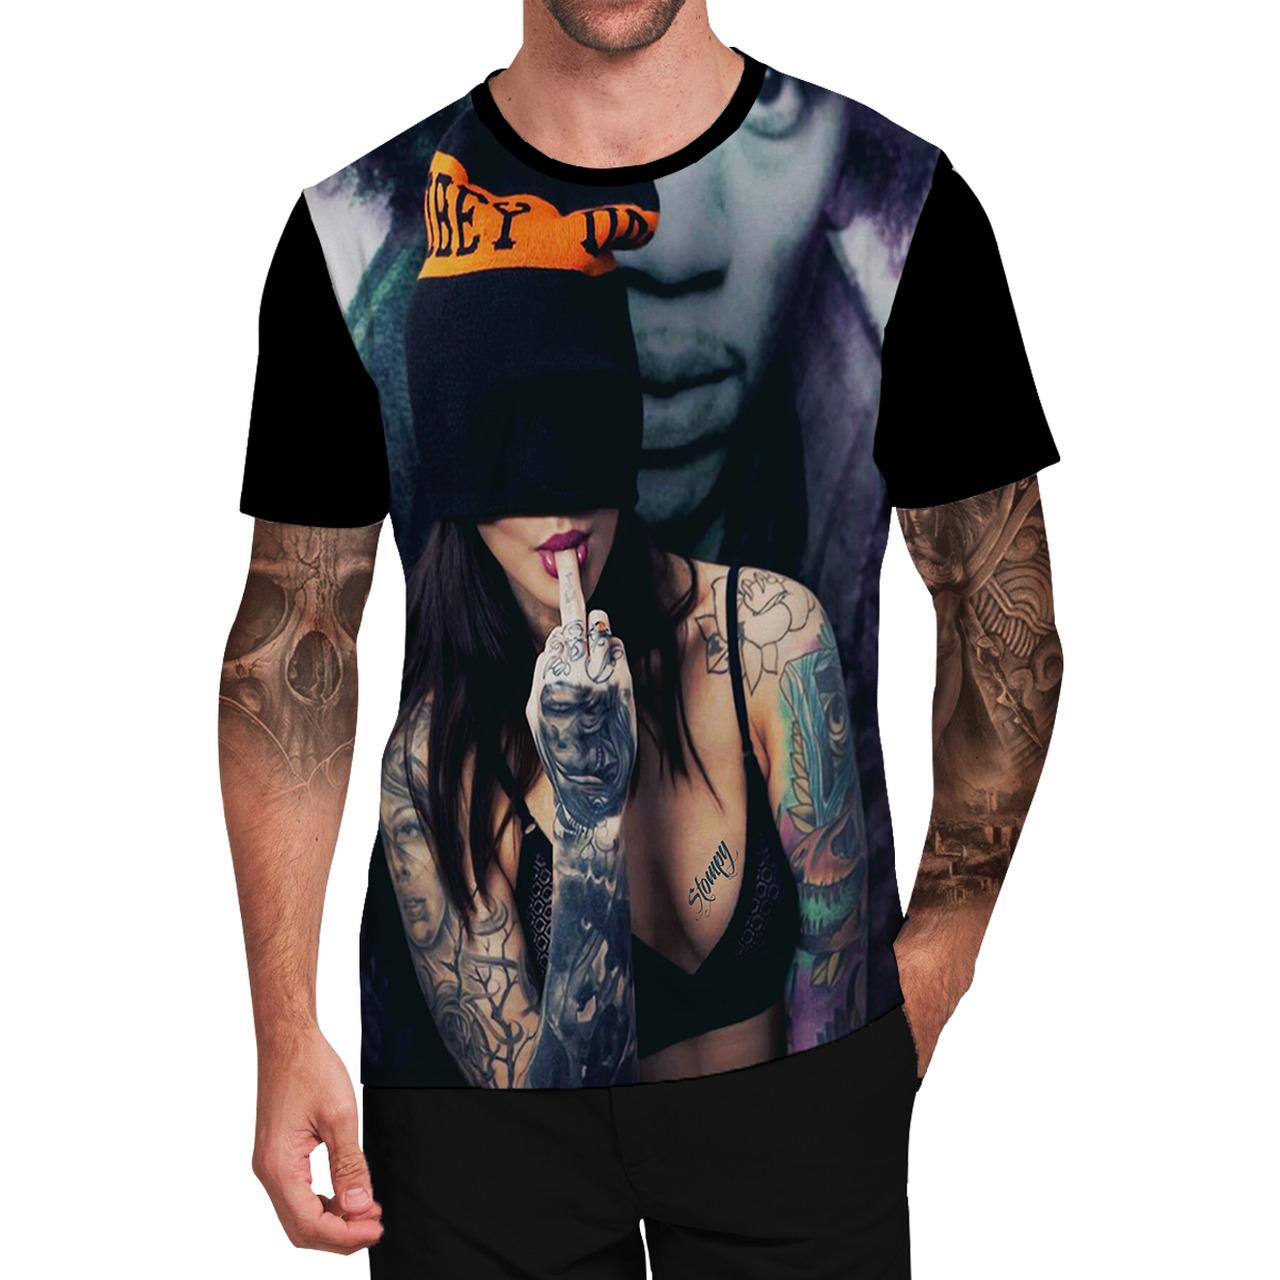 Stompy Camiseta Tattoo Tatuagem Caveira Skull 25